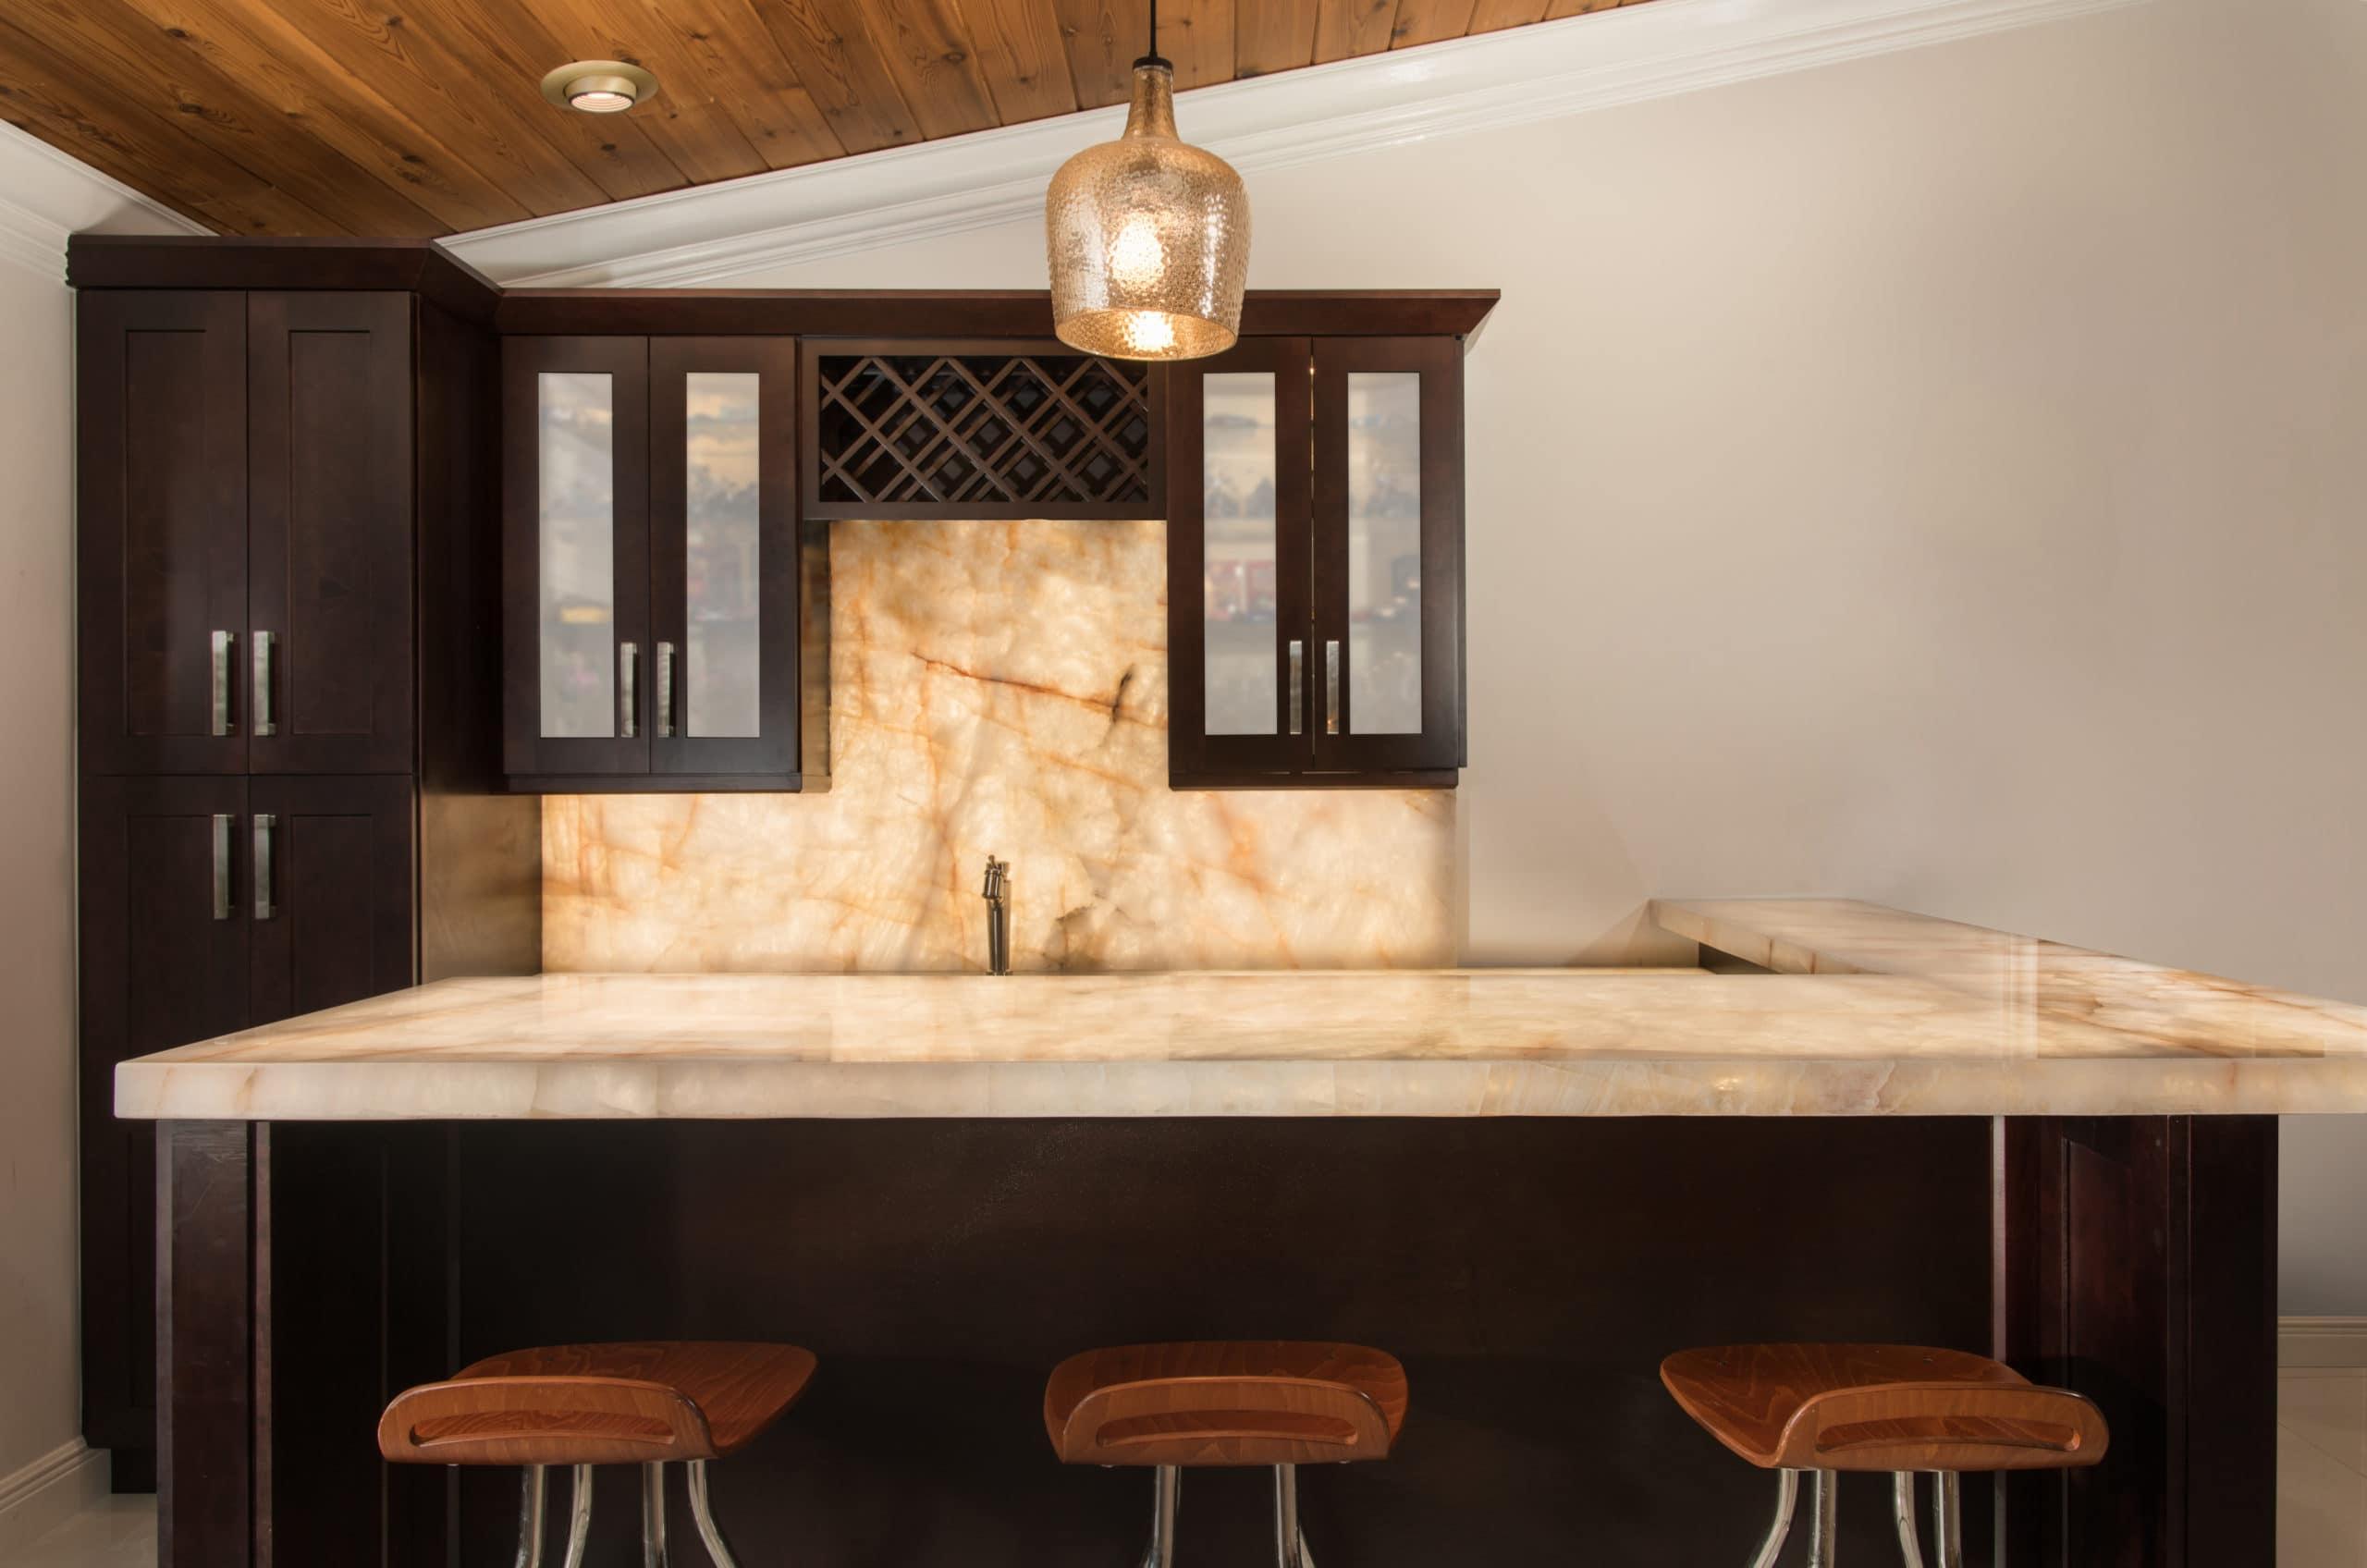 Cristallo Backlit Bar Scaled, Primestones® Granite, Quartz, Marble